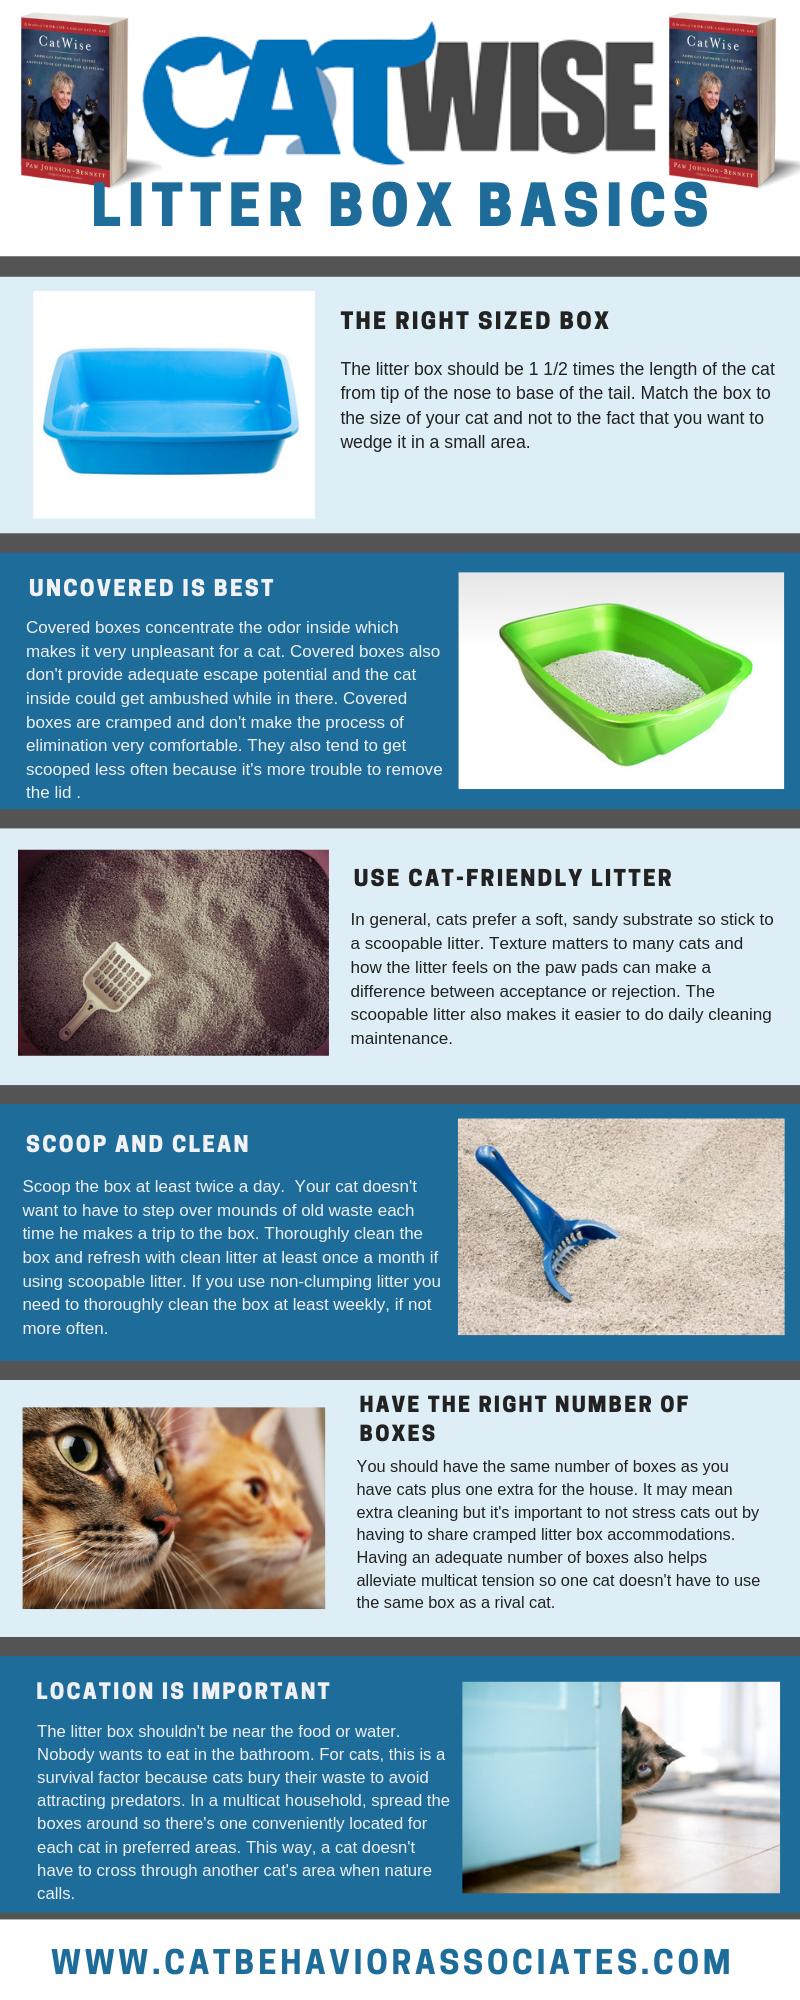 Catwise Litter Box Basics Litter Box Best Cat Litter Cat Infographic